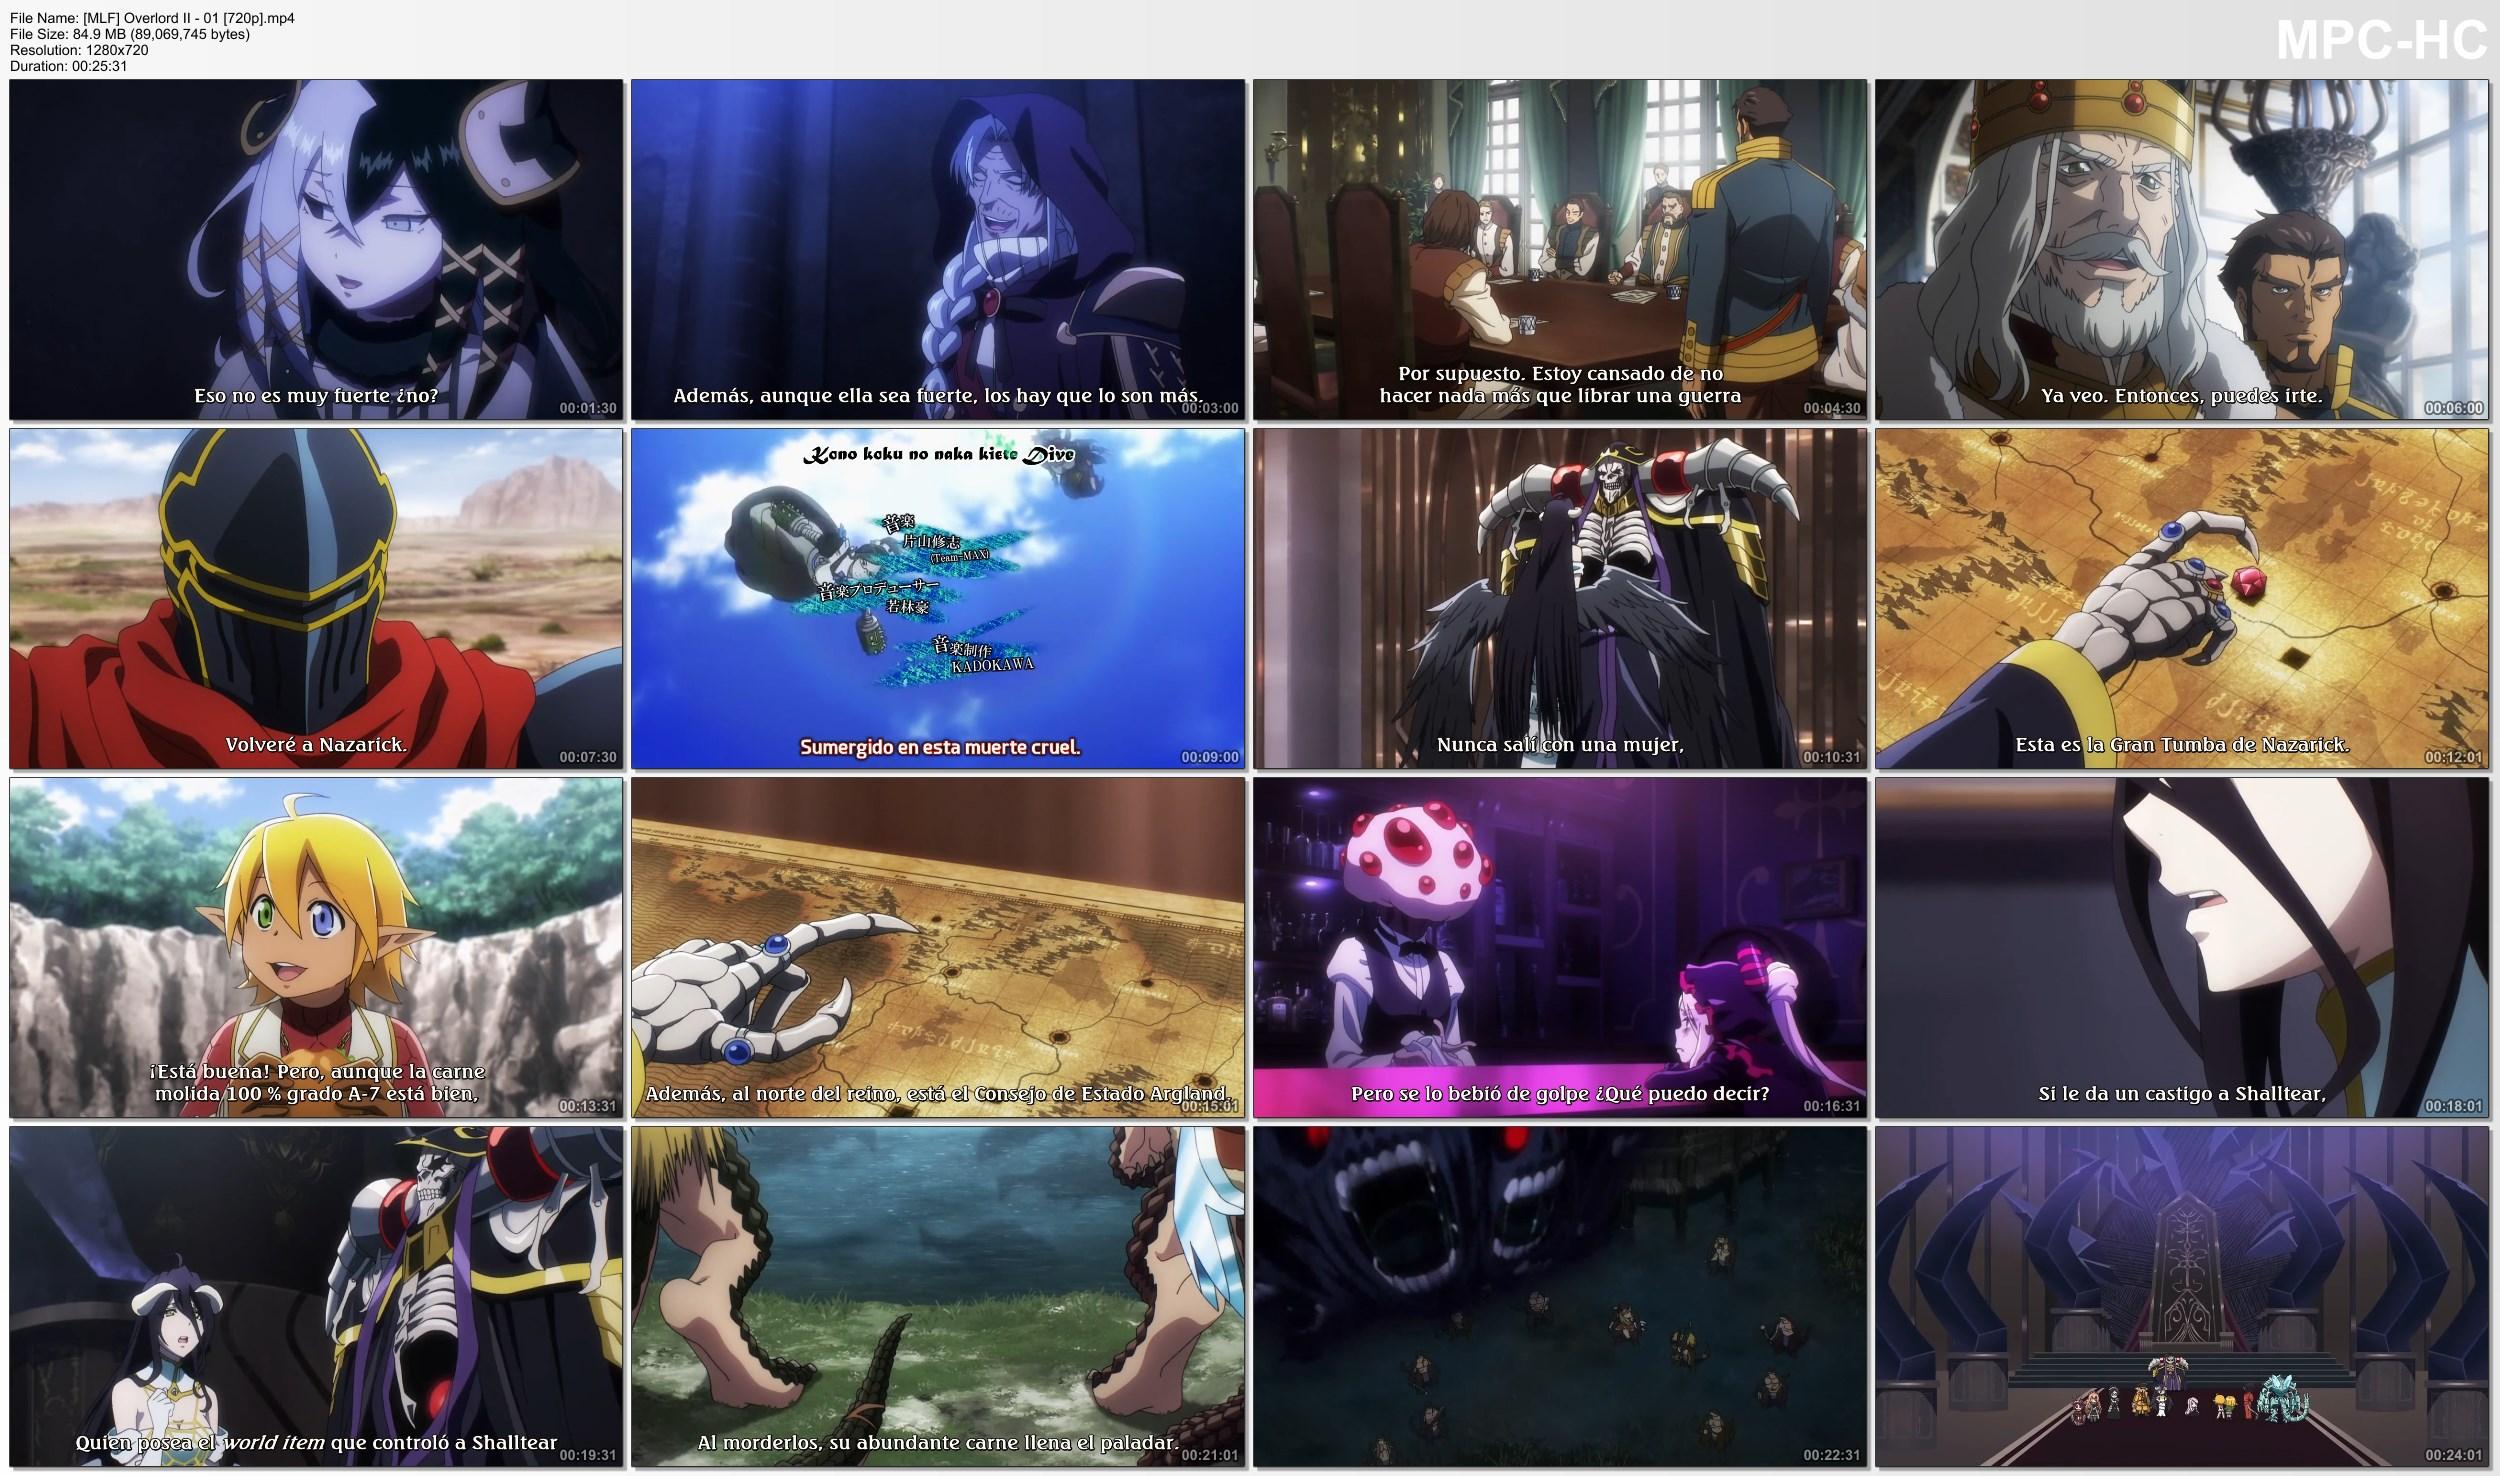 AwDmy5WnPDYr6 - [Aporte] Overlord II [13/13][85MB][MLF][MEGA][Concluido...] - Anime Ligero [Descargas]